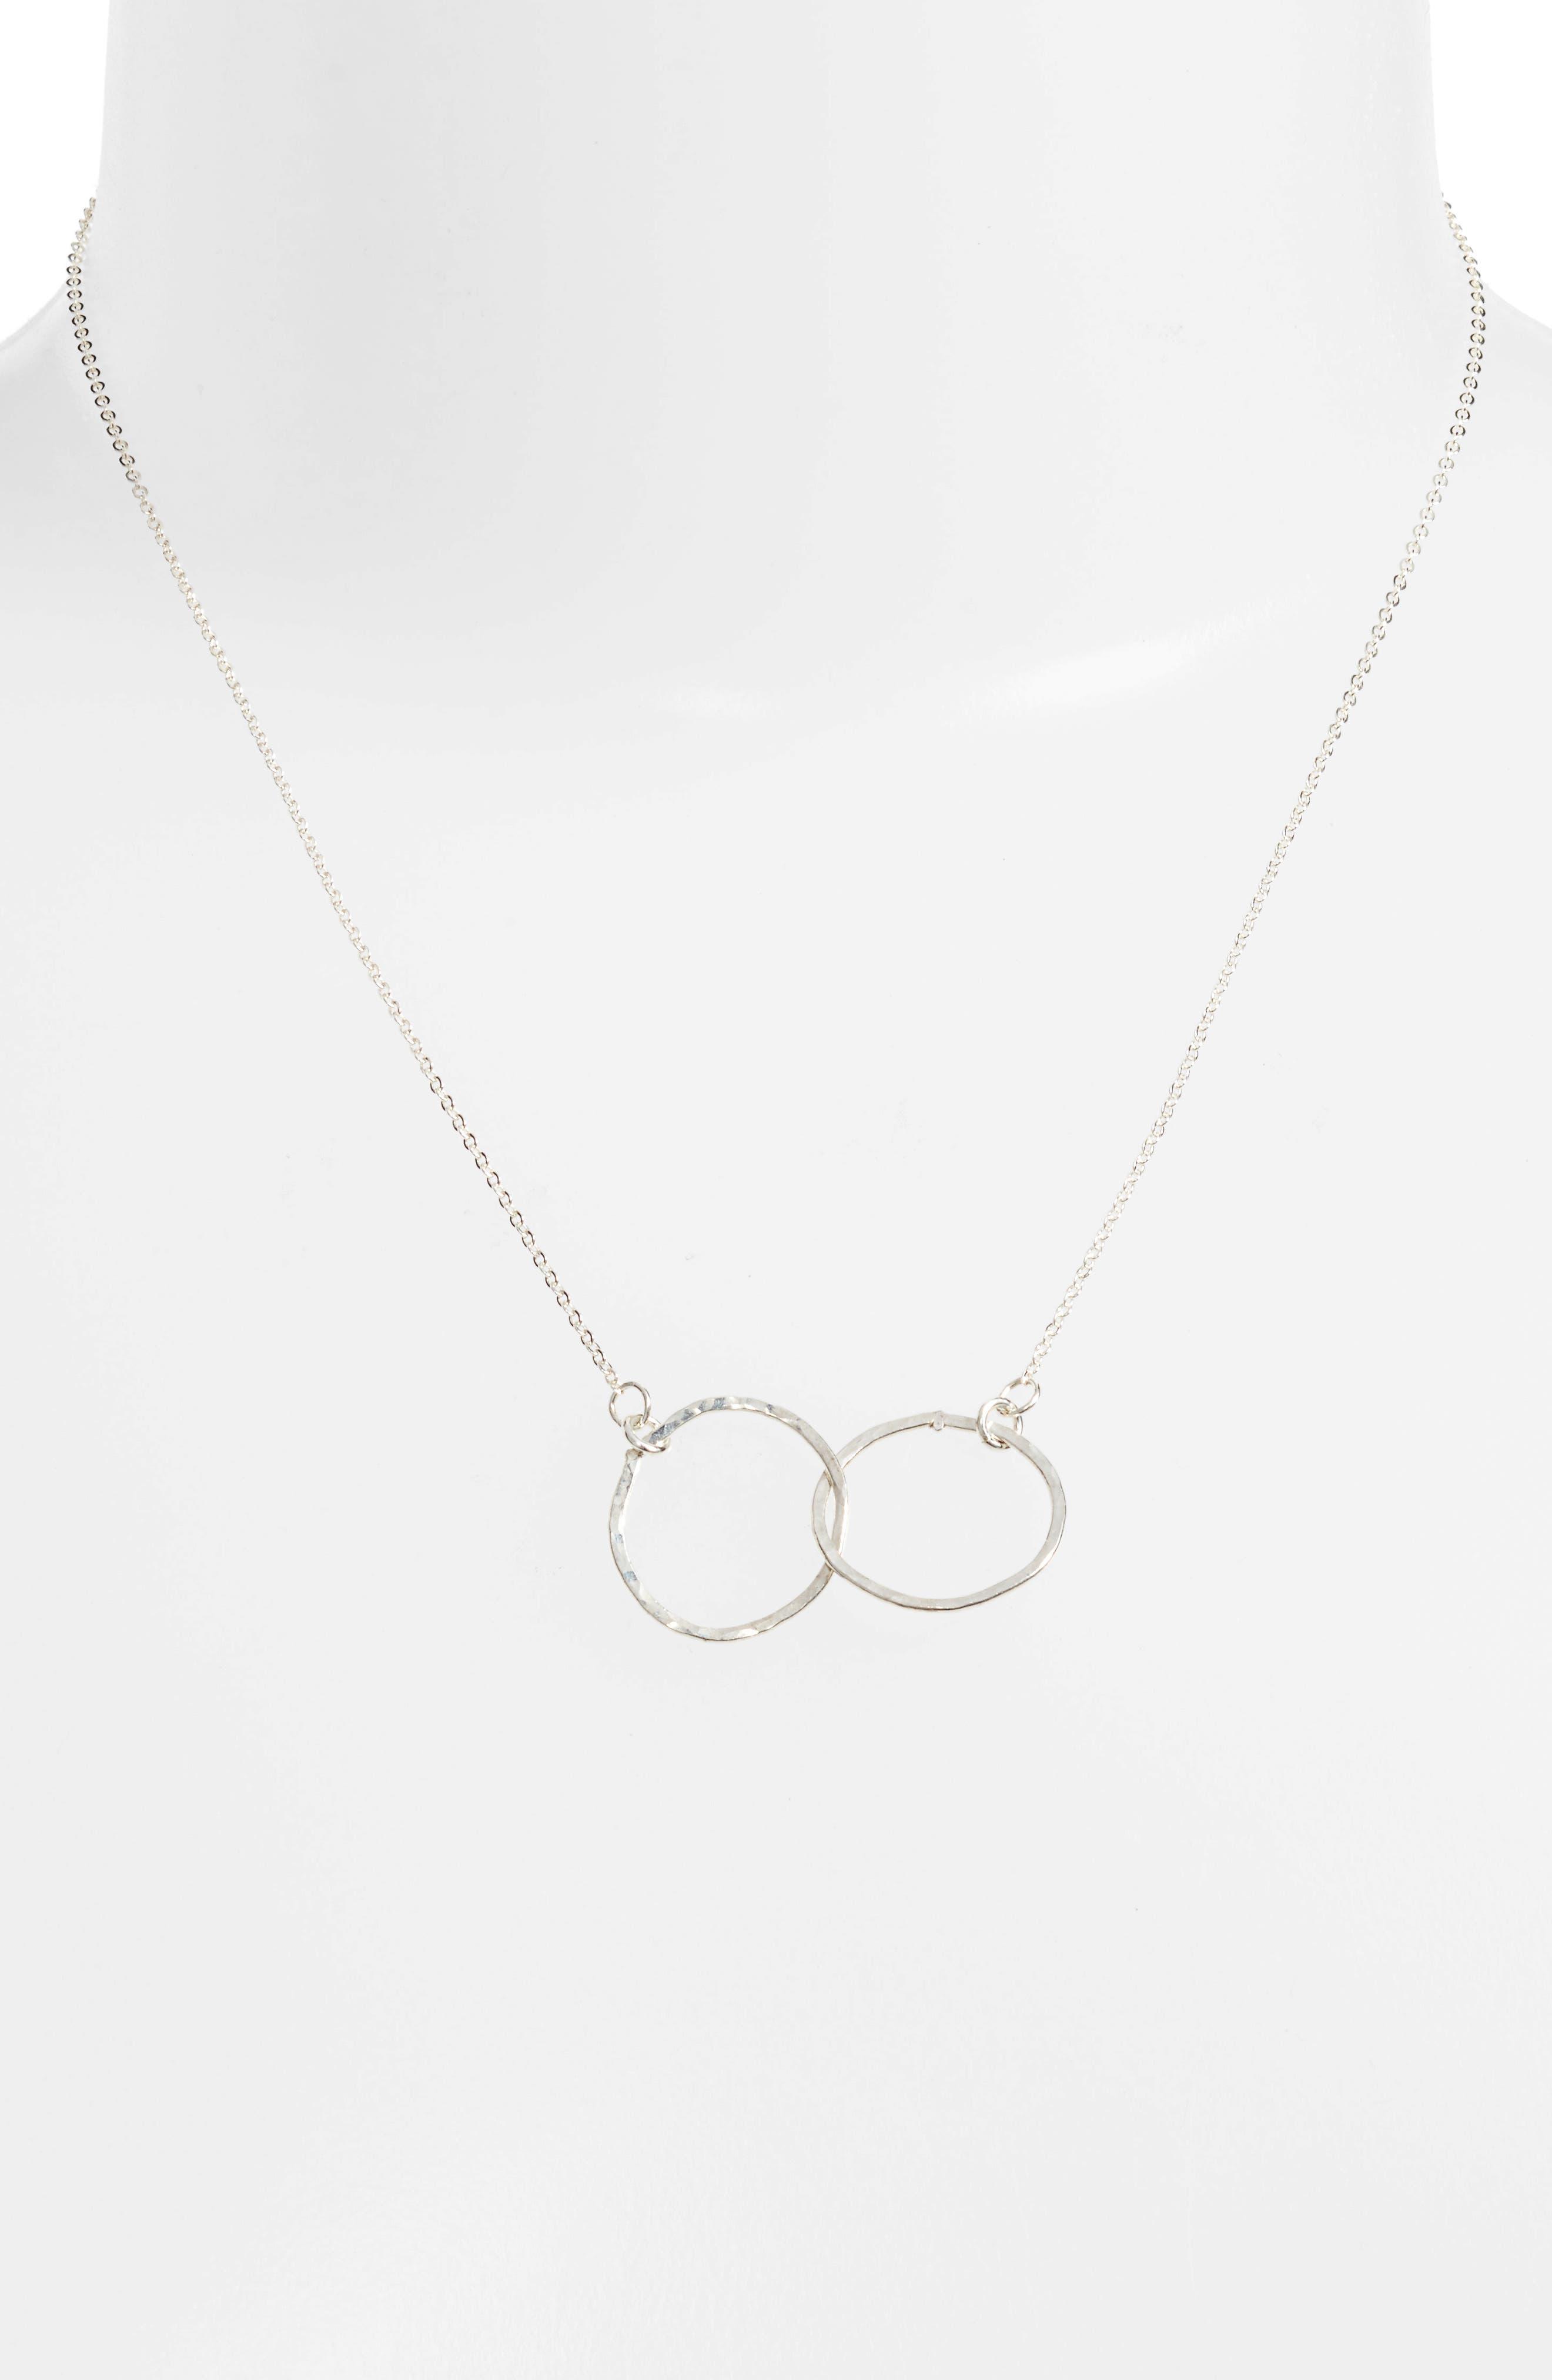 Nashelle Lucky Eternity Necklace